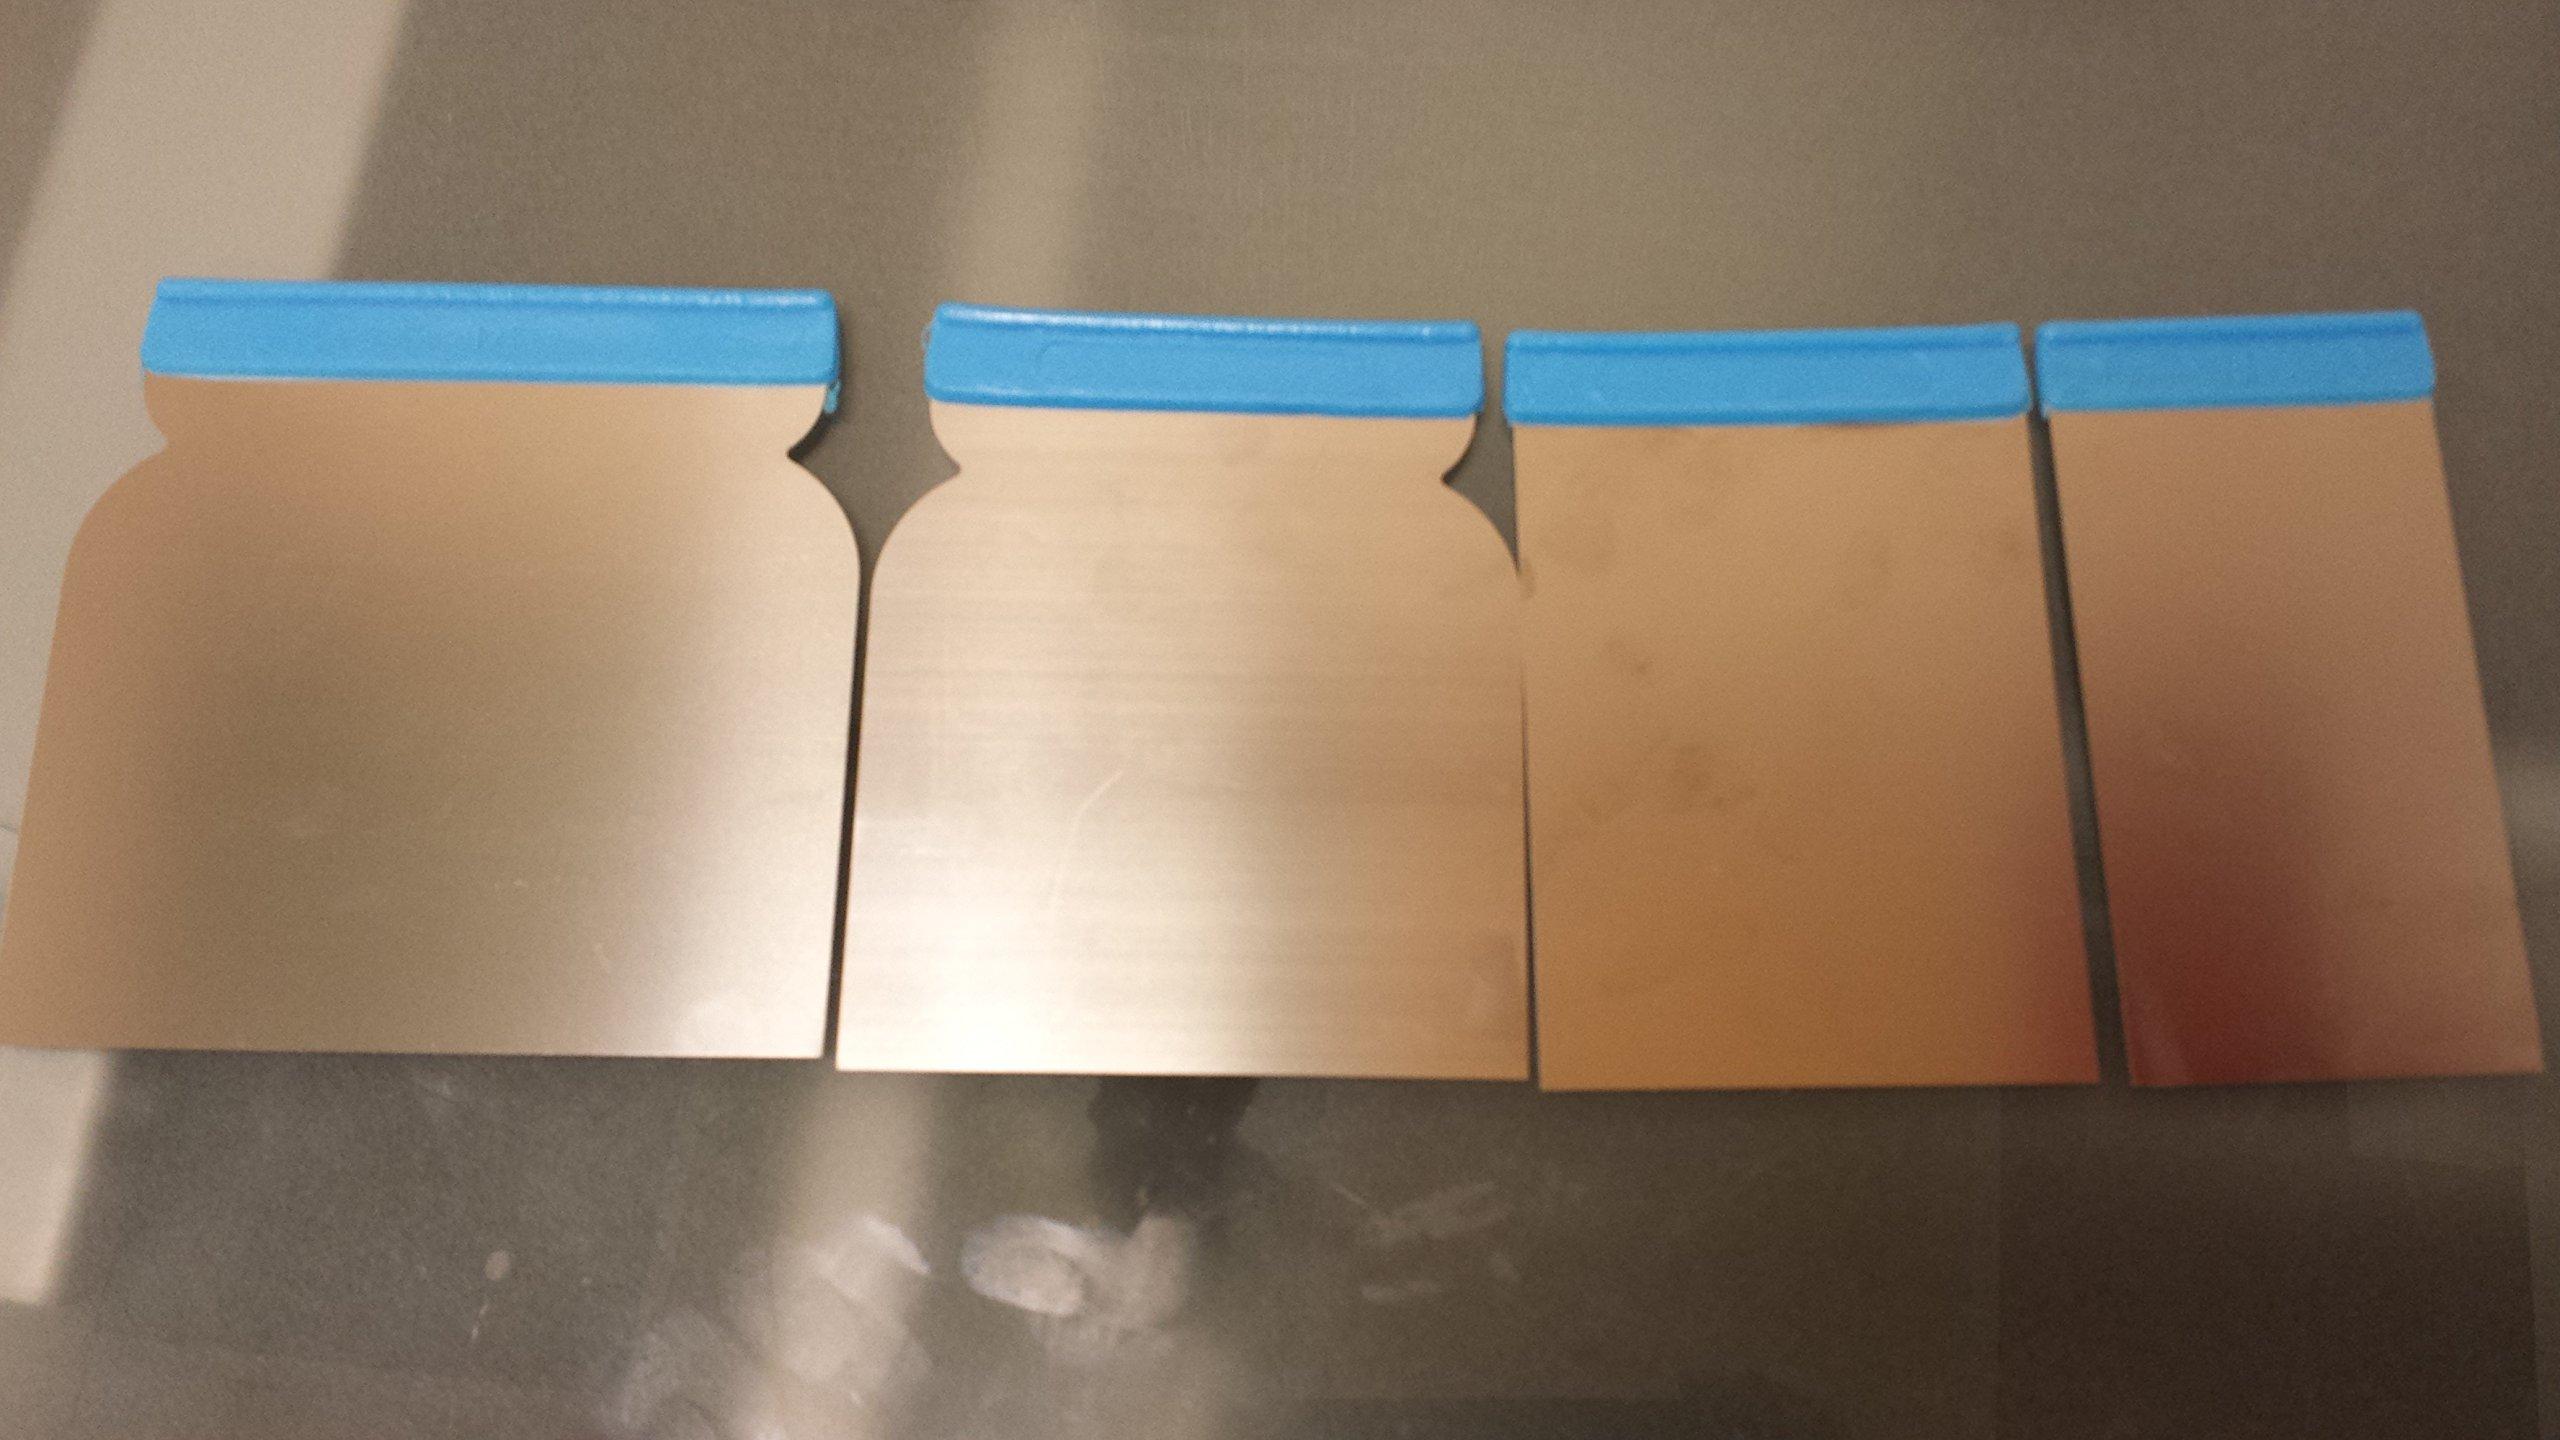 Japanese Knife Spatula Scraper Kit Venetian plaster spatulas set of 4